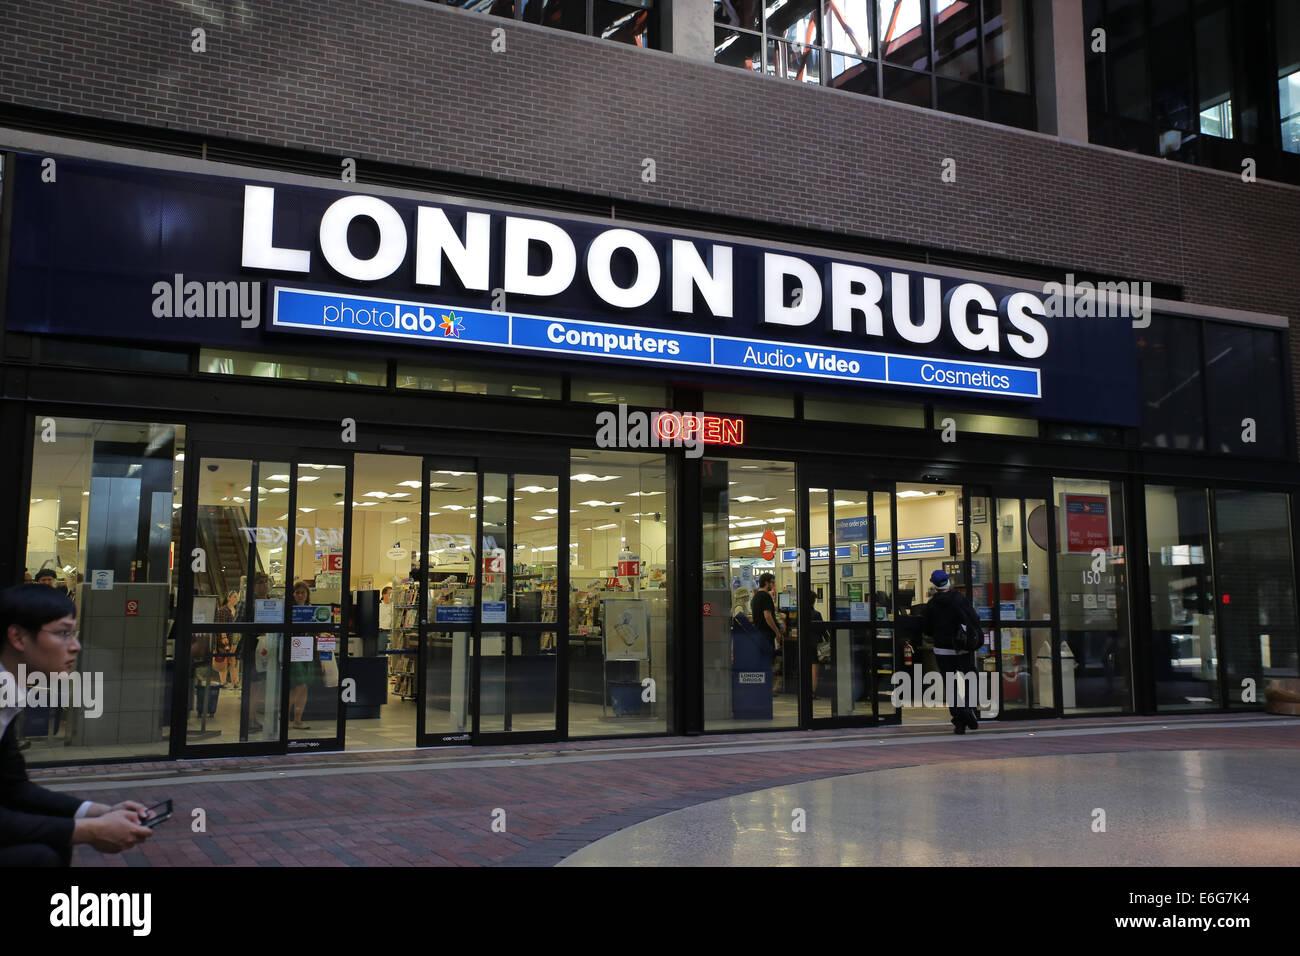 London drug store Vancouver Photo Stock